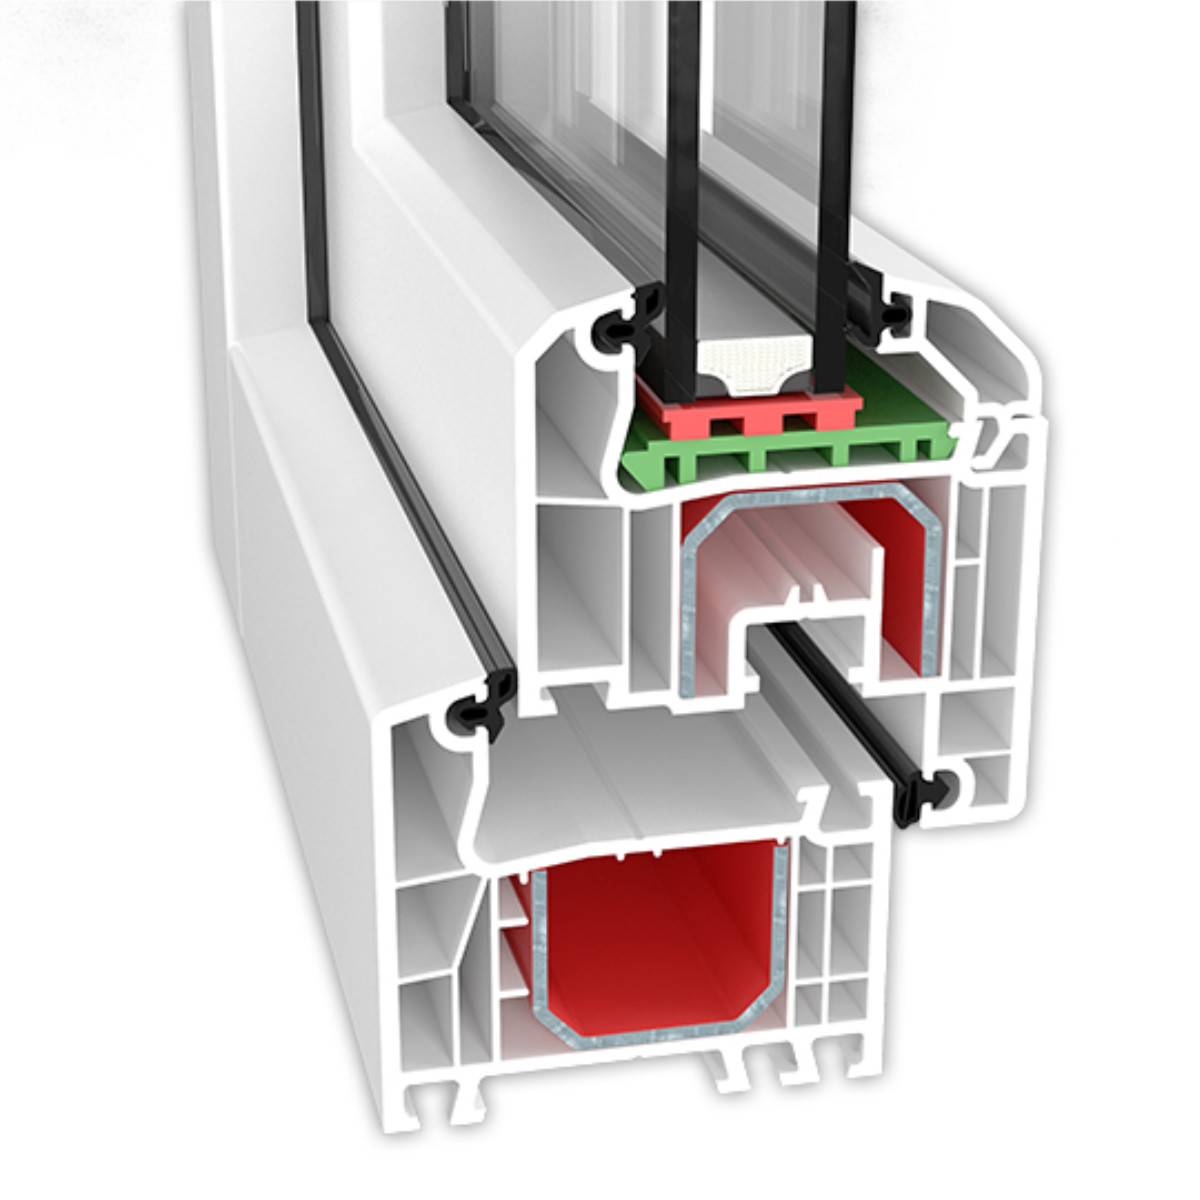 Full Size of Aluplast Erfahrung Ideal 4000 70mm Fenster Online Wohnzimmer Aluplast Erfahrung